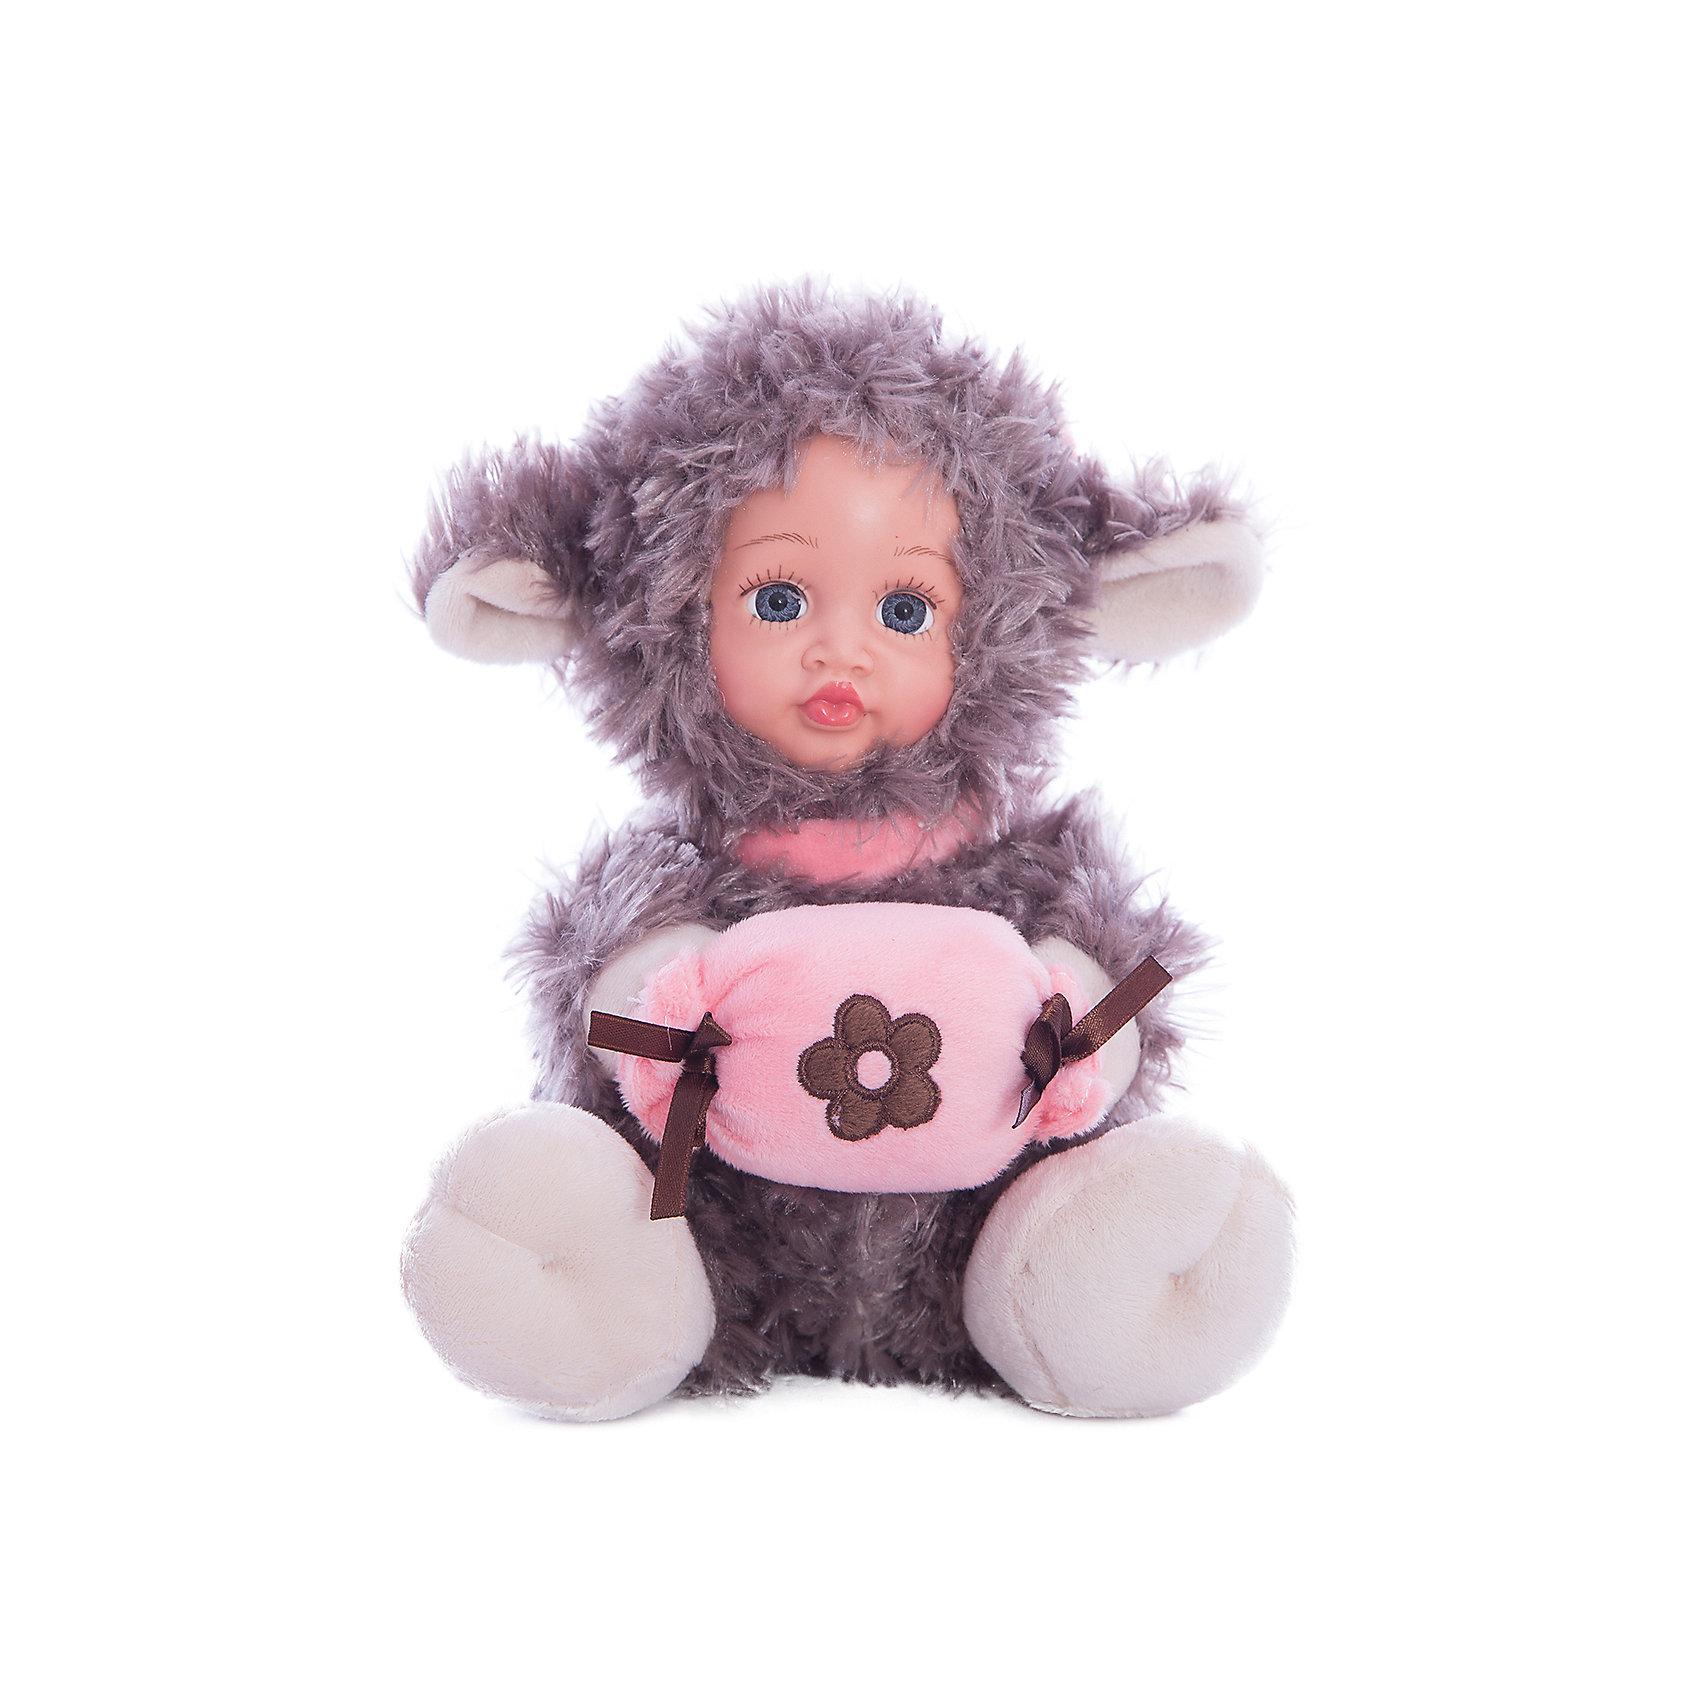 Fluffy Family Игрушка Мой ягненок, Fluffy Family игрушка мгка fluffy family диджей 681031